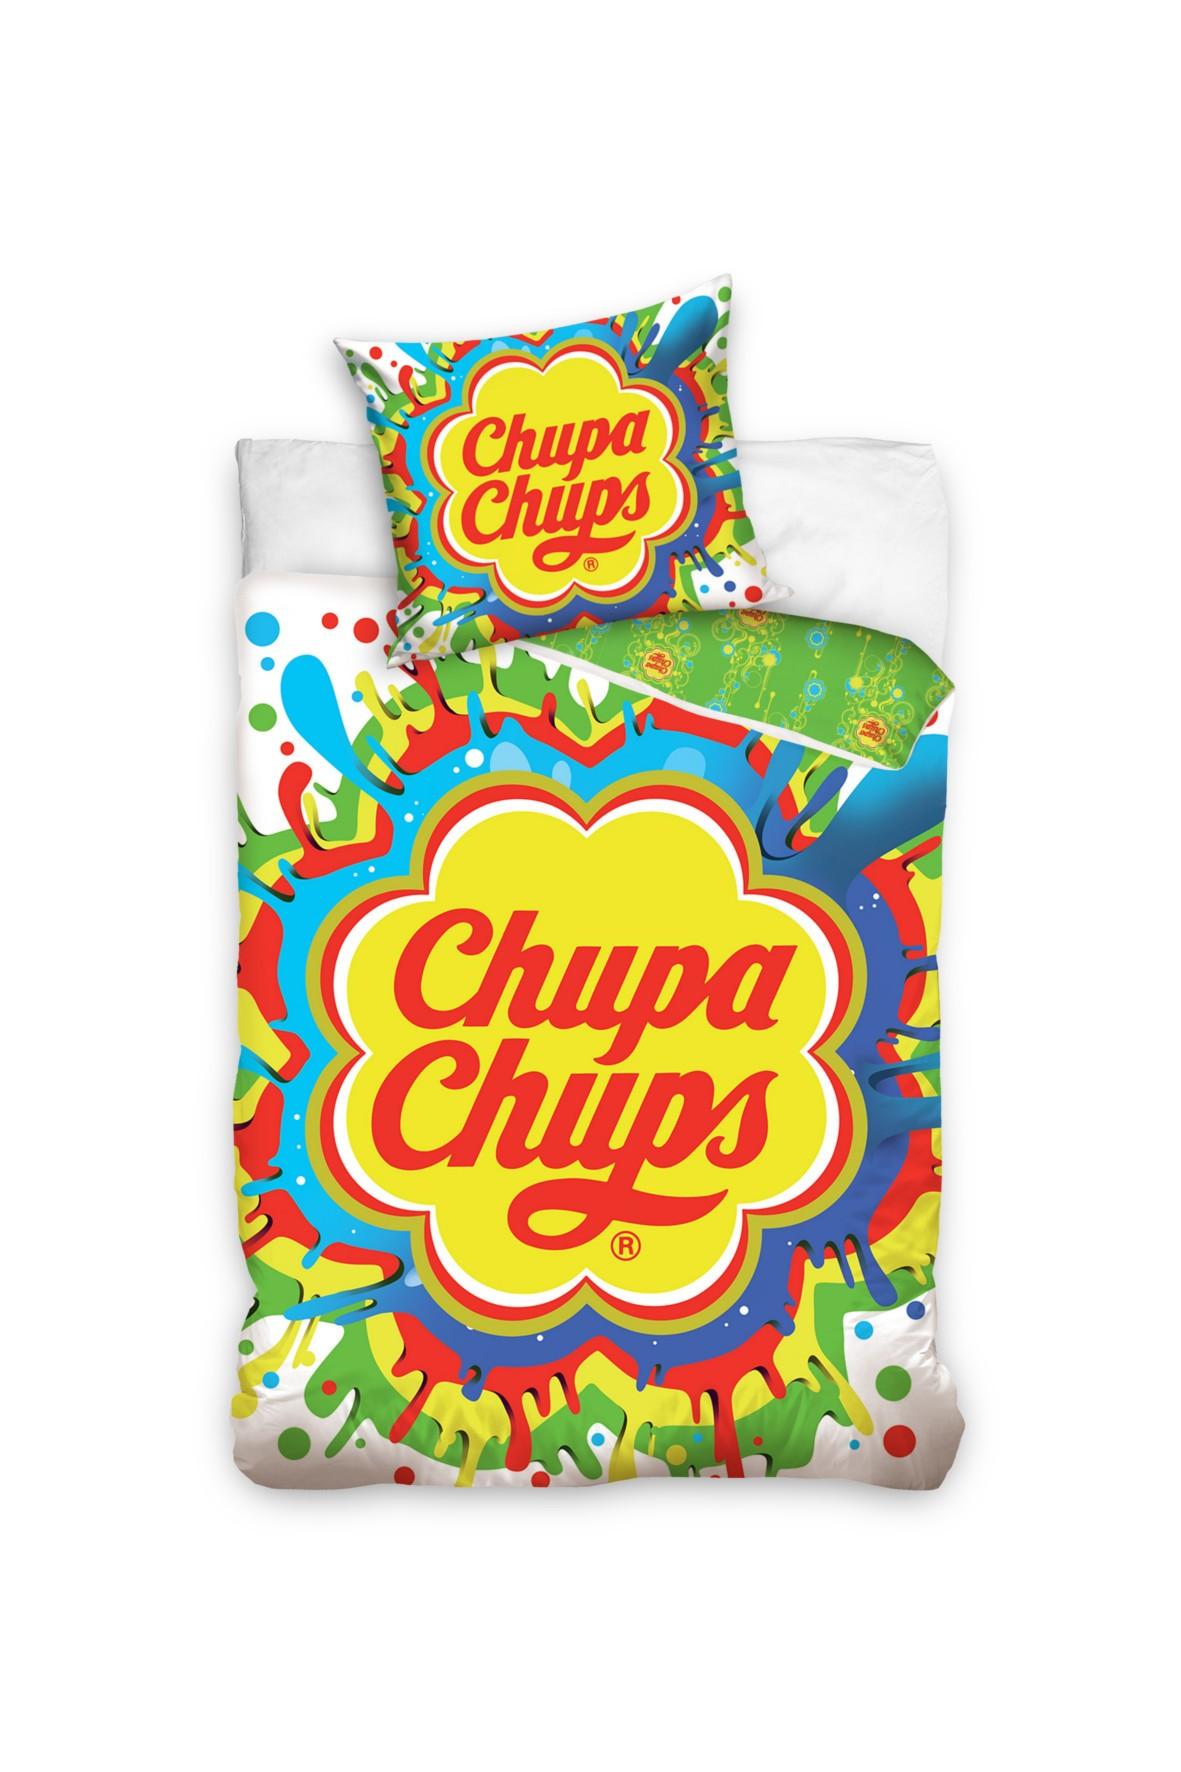 Kpl. pościeli bawełnianej 160x200+70x80 cm                    Chupa Chups       CHUPA195005